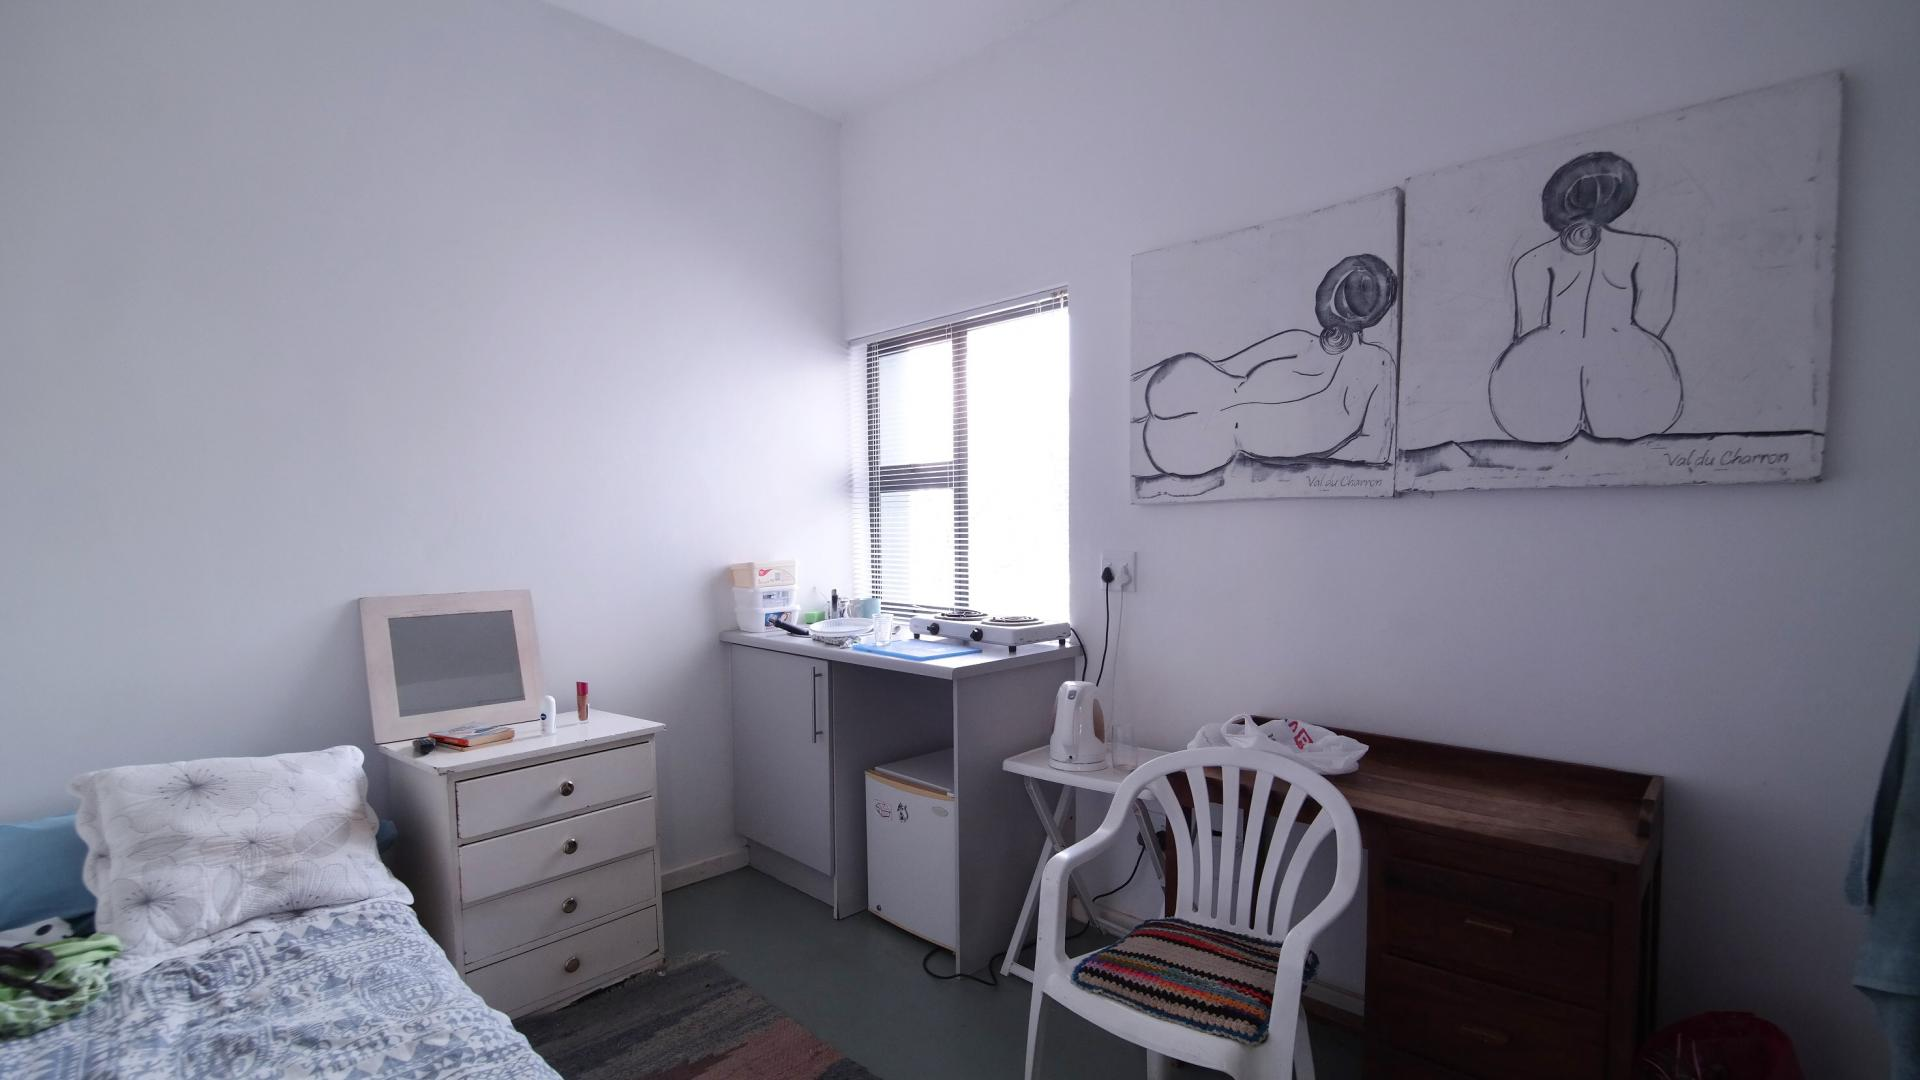 5 bedroom house for sale for sale in silver stream estate home sell mr127247 myroof. Black Bedroom Furniture Sets. Home Design Ideas